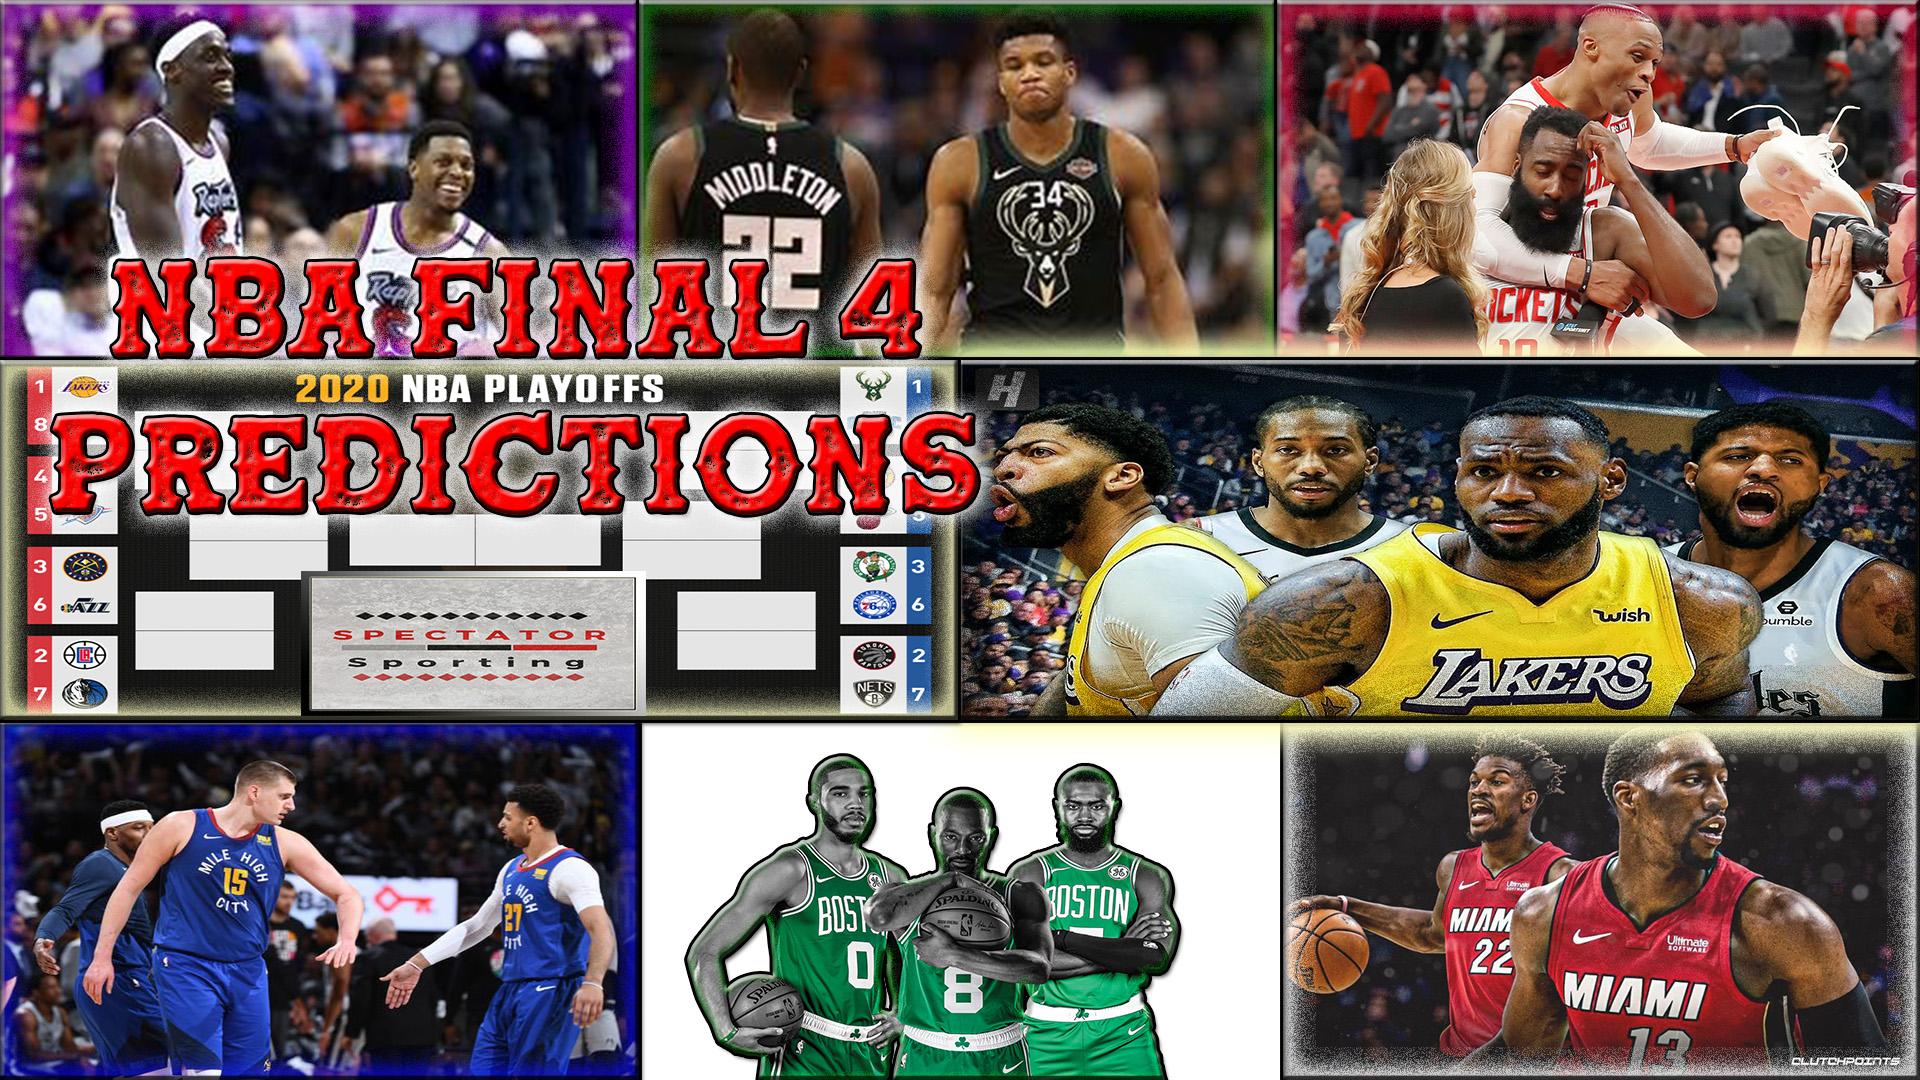 Nba Playoffs Final 4 Predictions 2020 Spectator Sporting